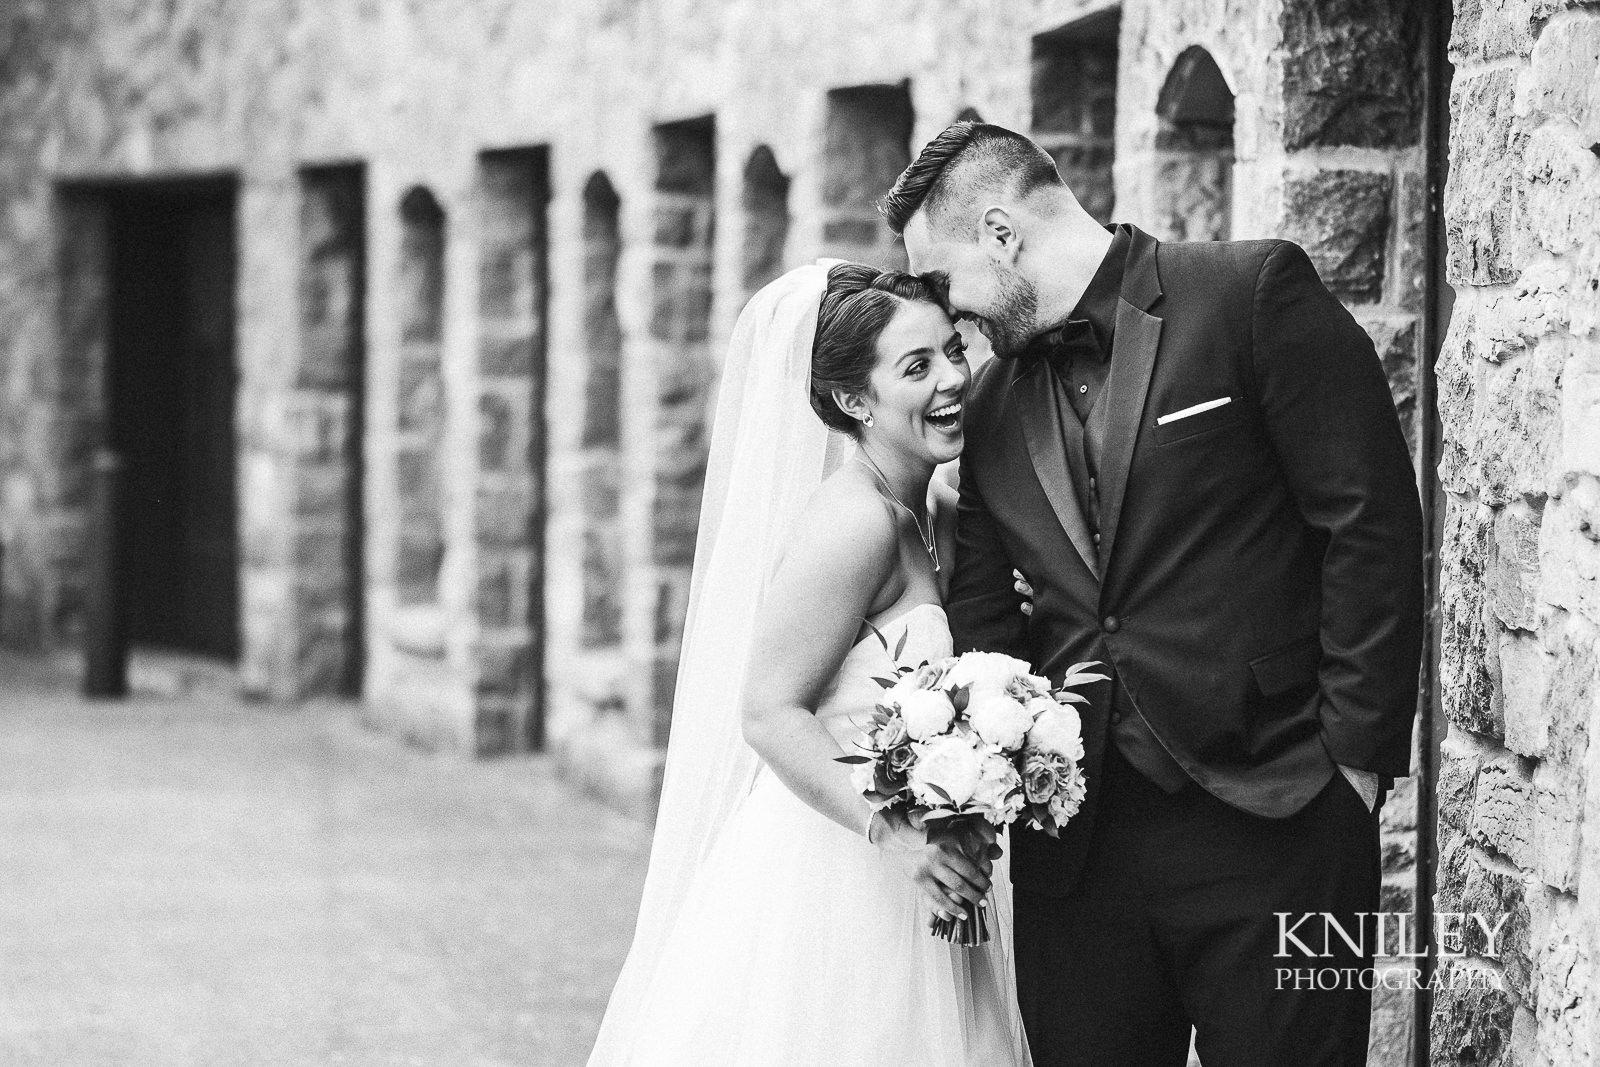 047 - Hoyt Lake Buffalo NY Wedding Pictures -XT2A7703.jpg